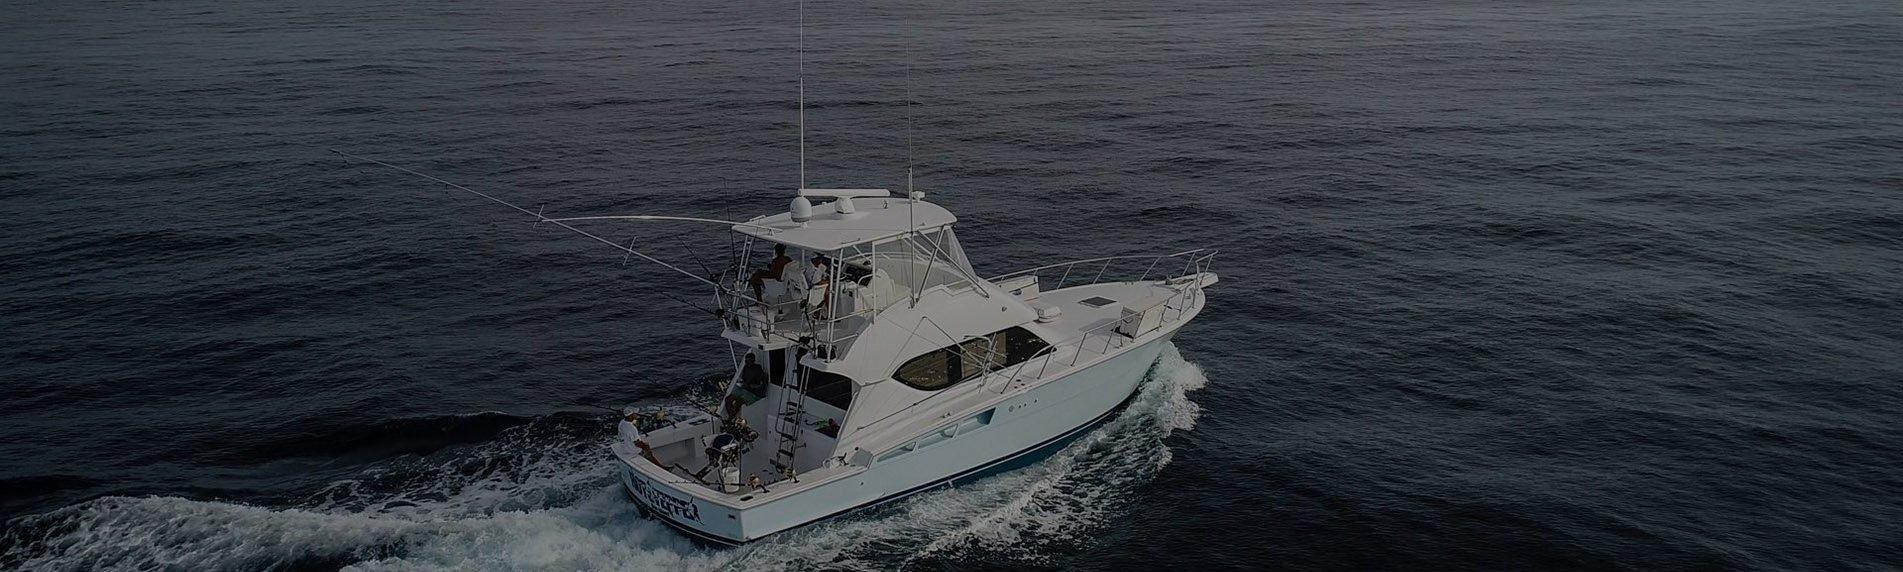 Aruba Boat Rental